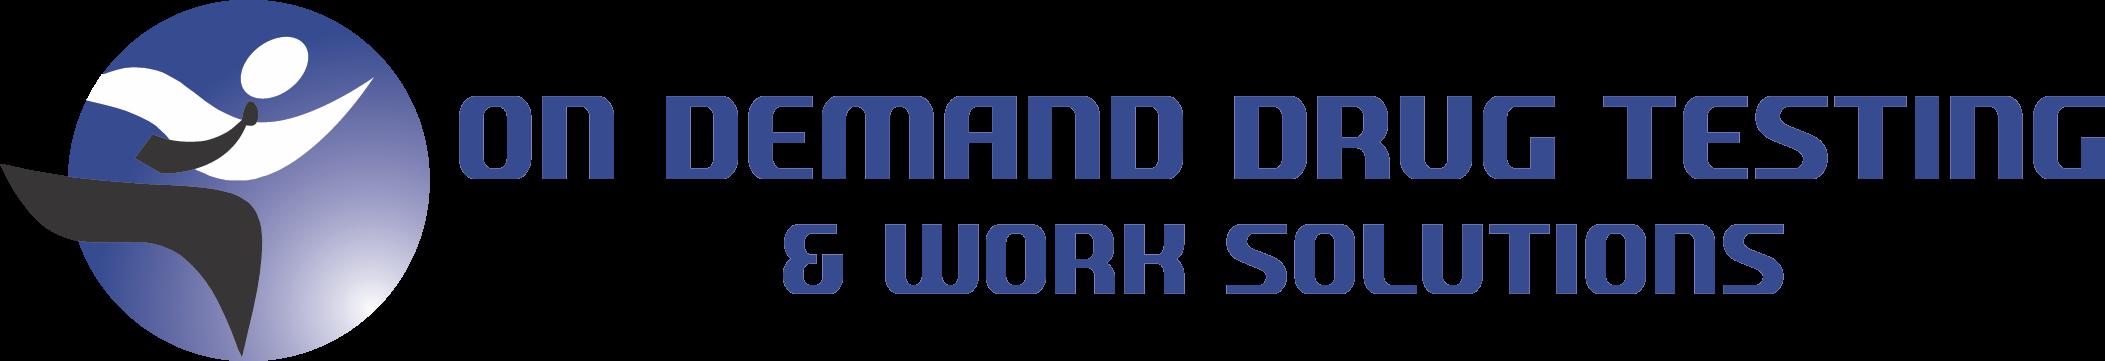 On Demand Drug Testing Logo